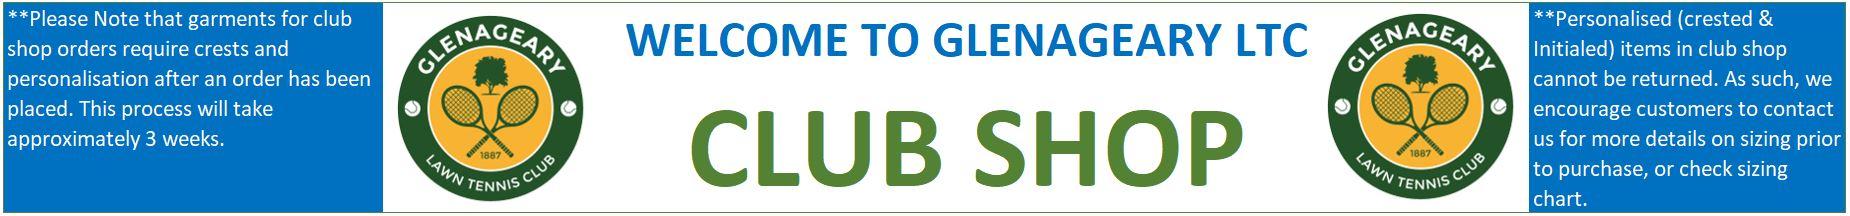 Glenageary LTC